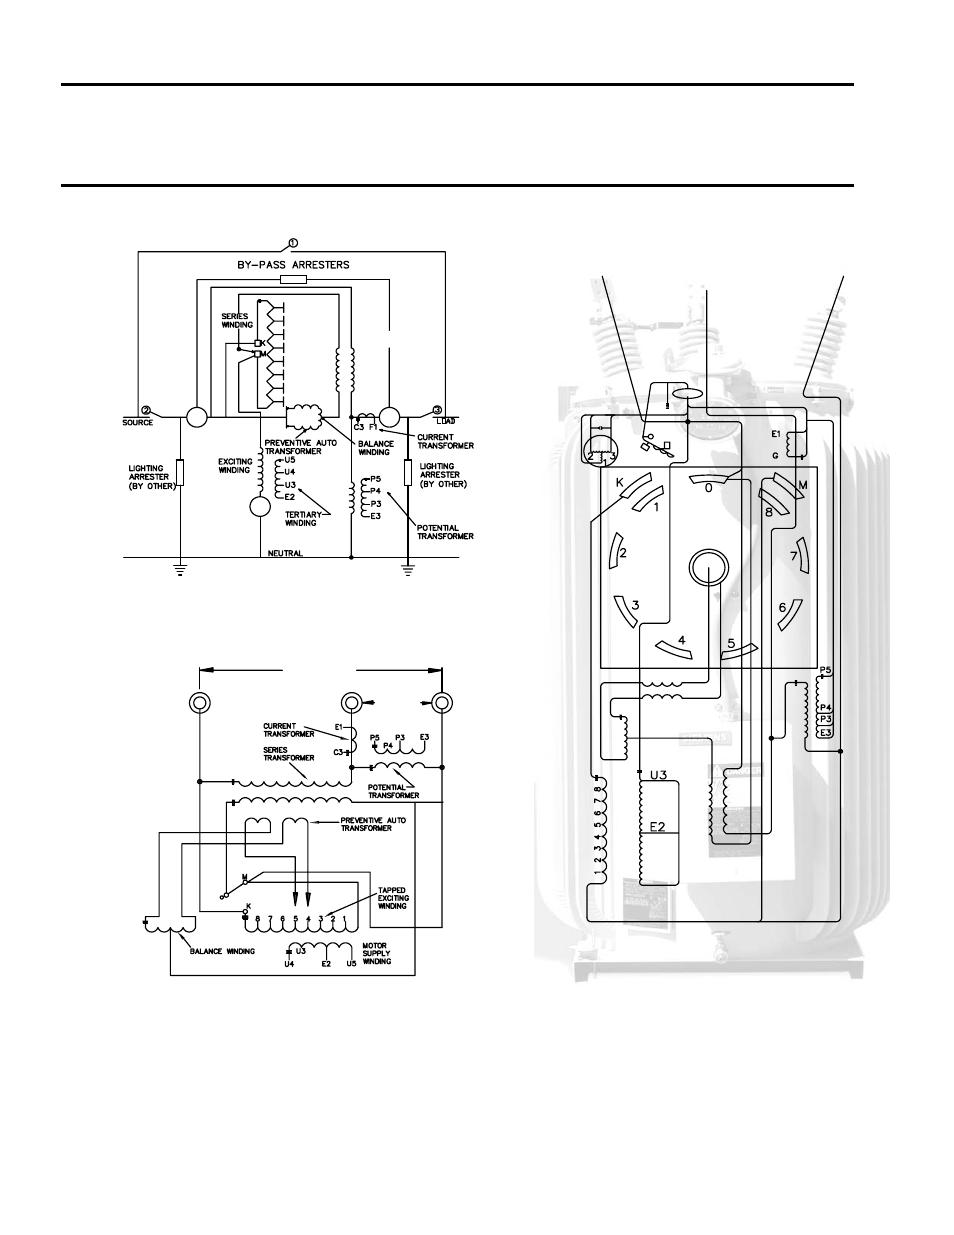 medium resolution of connection diagrams series transformer design siemens jfr distribution step voltage regulator 21 115532 001 user manual page 12 28